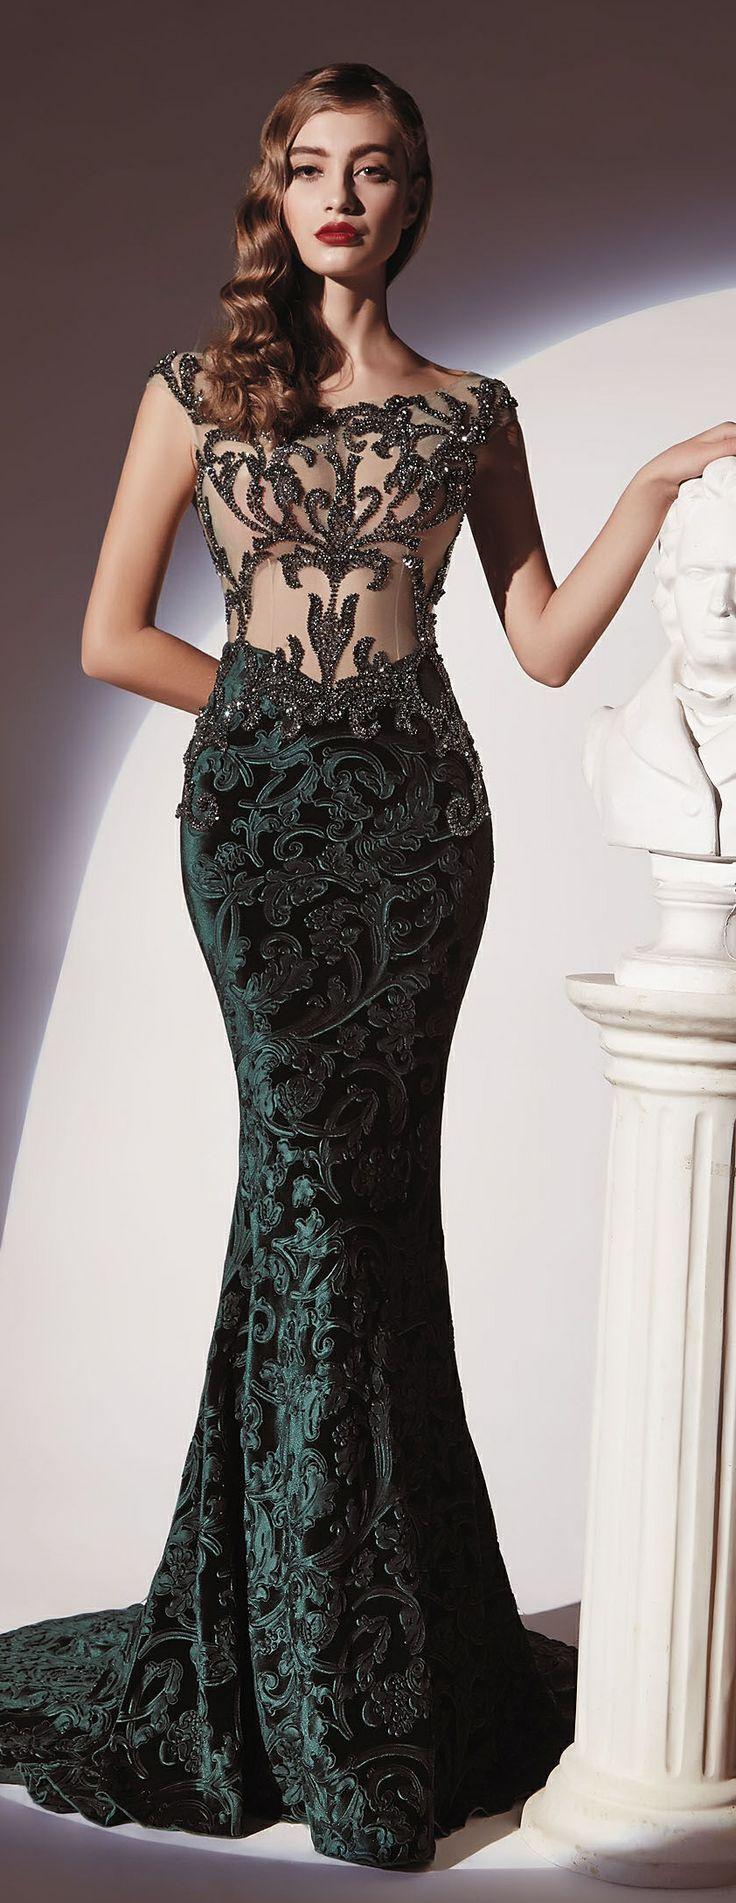 127 besten Long dresses Bilder auf Pinterest   Abendkleid, Lange ...